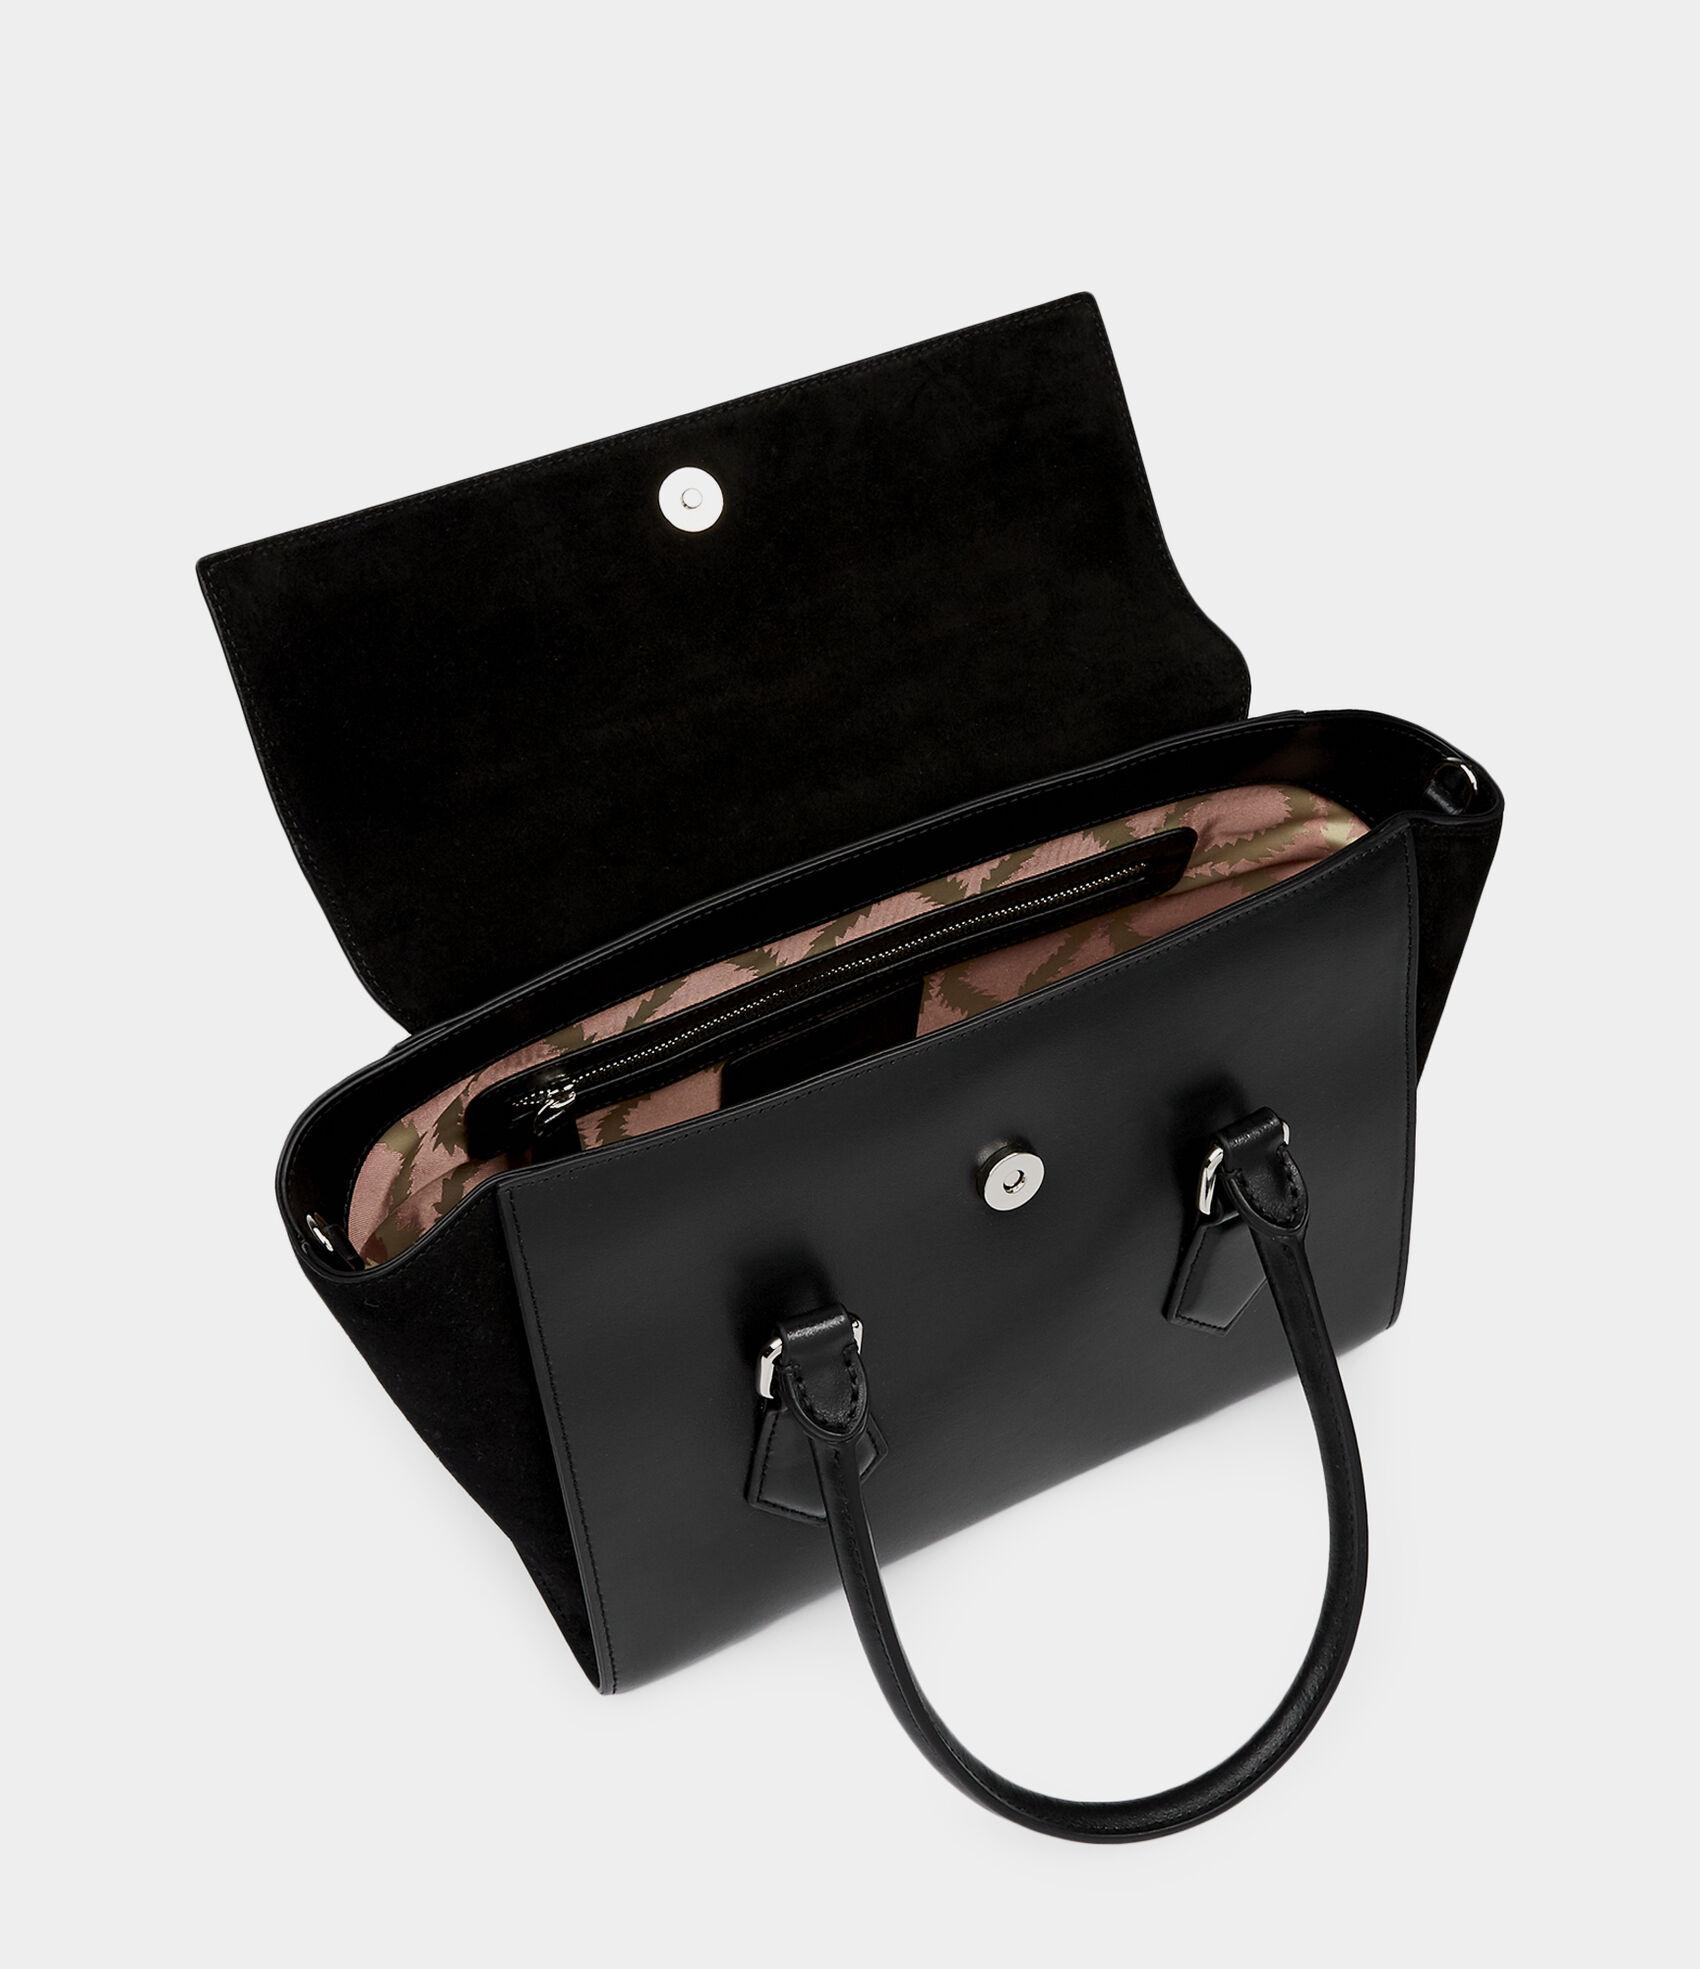 Vivienne Westwood Women S Designer Handbags Matilda Medium Handbag Black